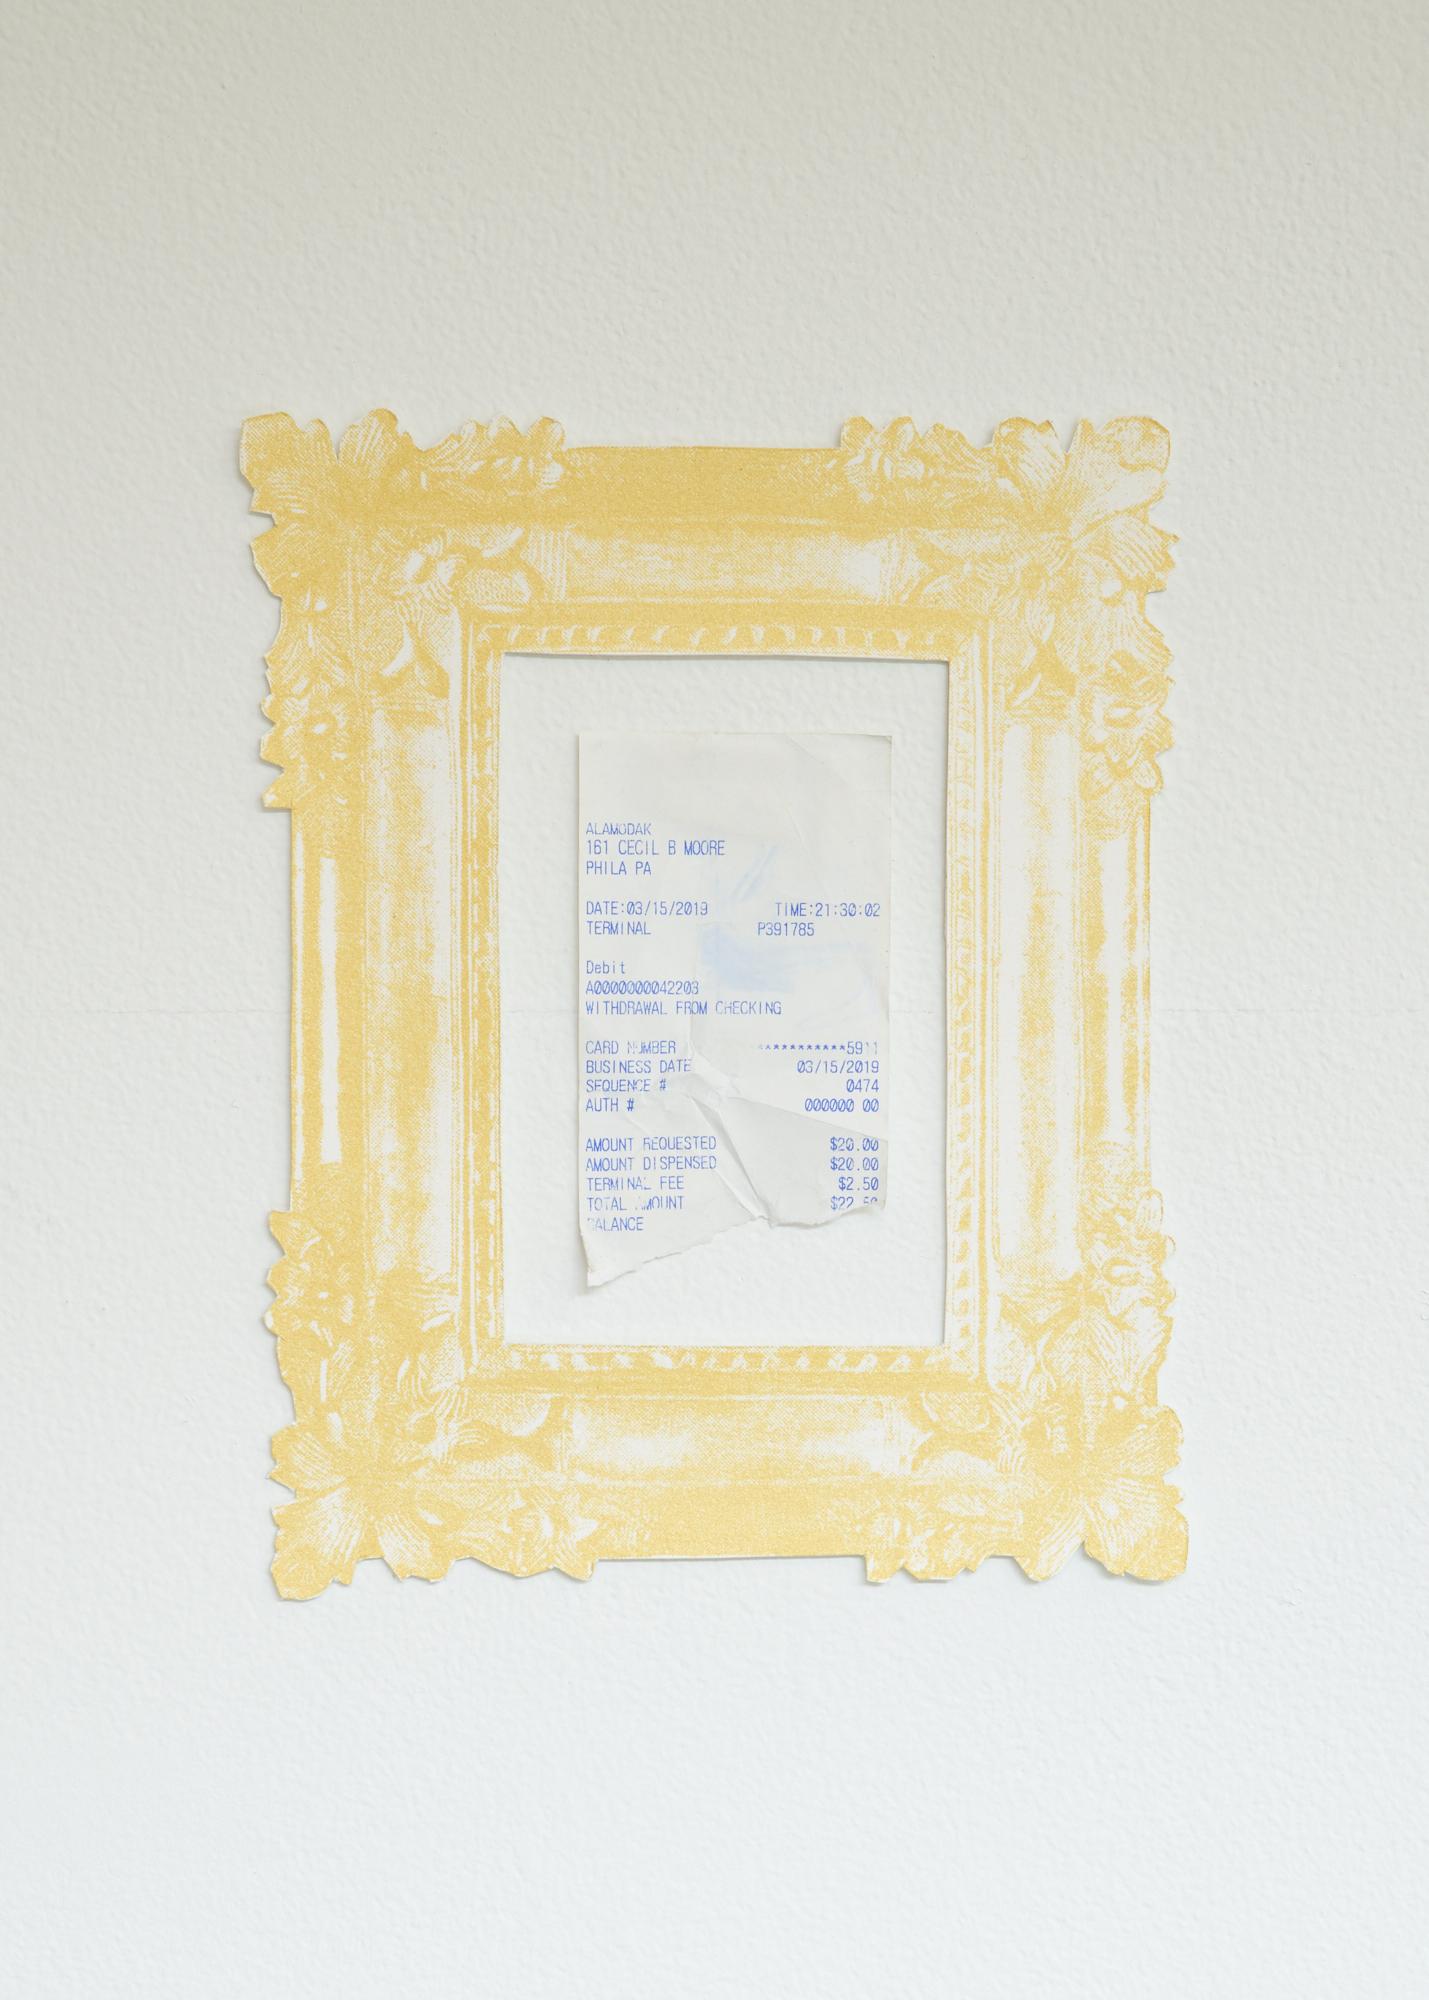 Framed receipt